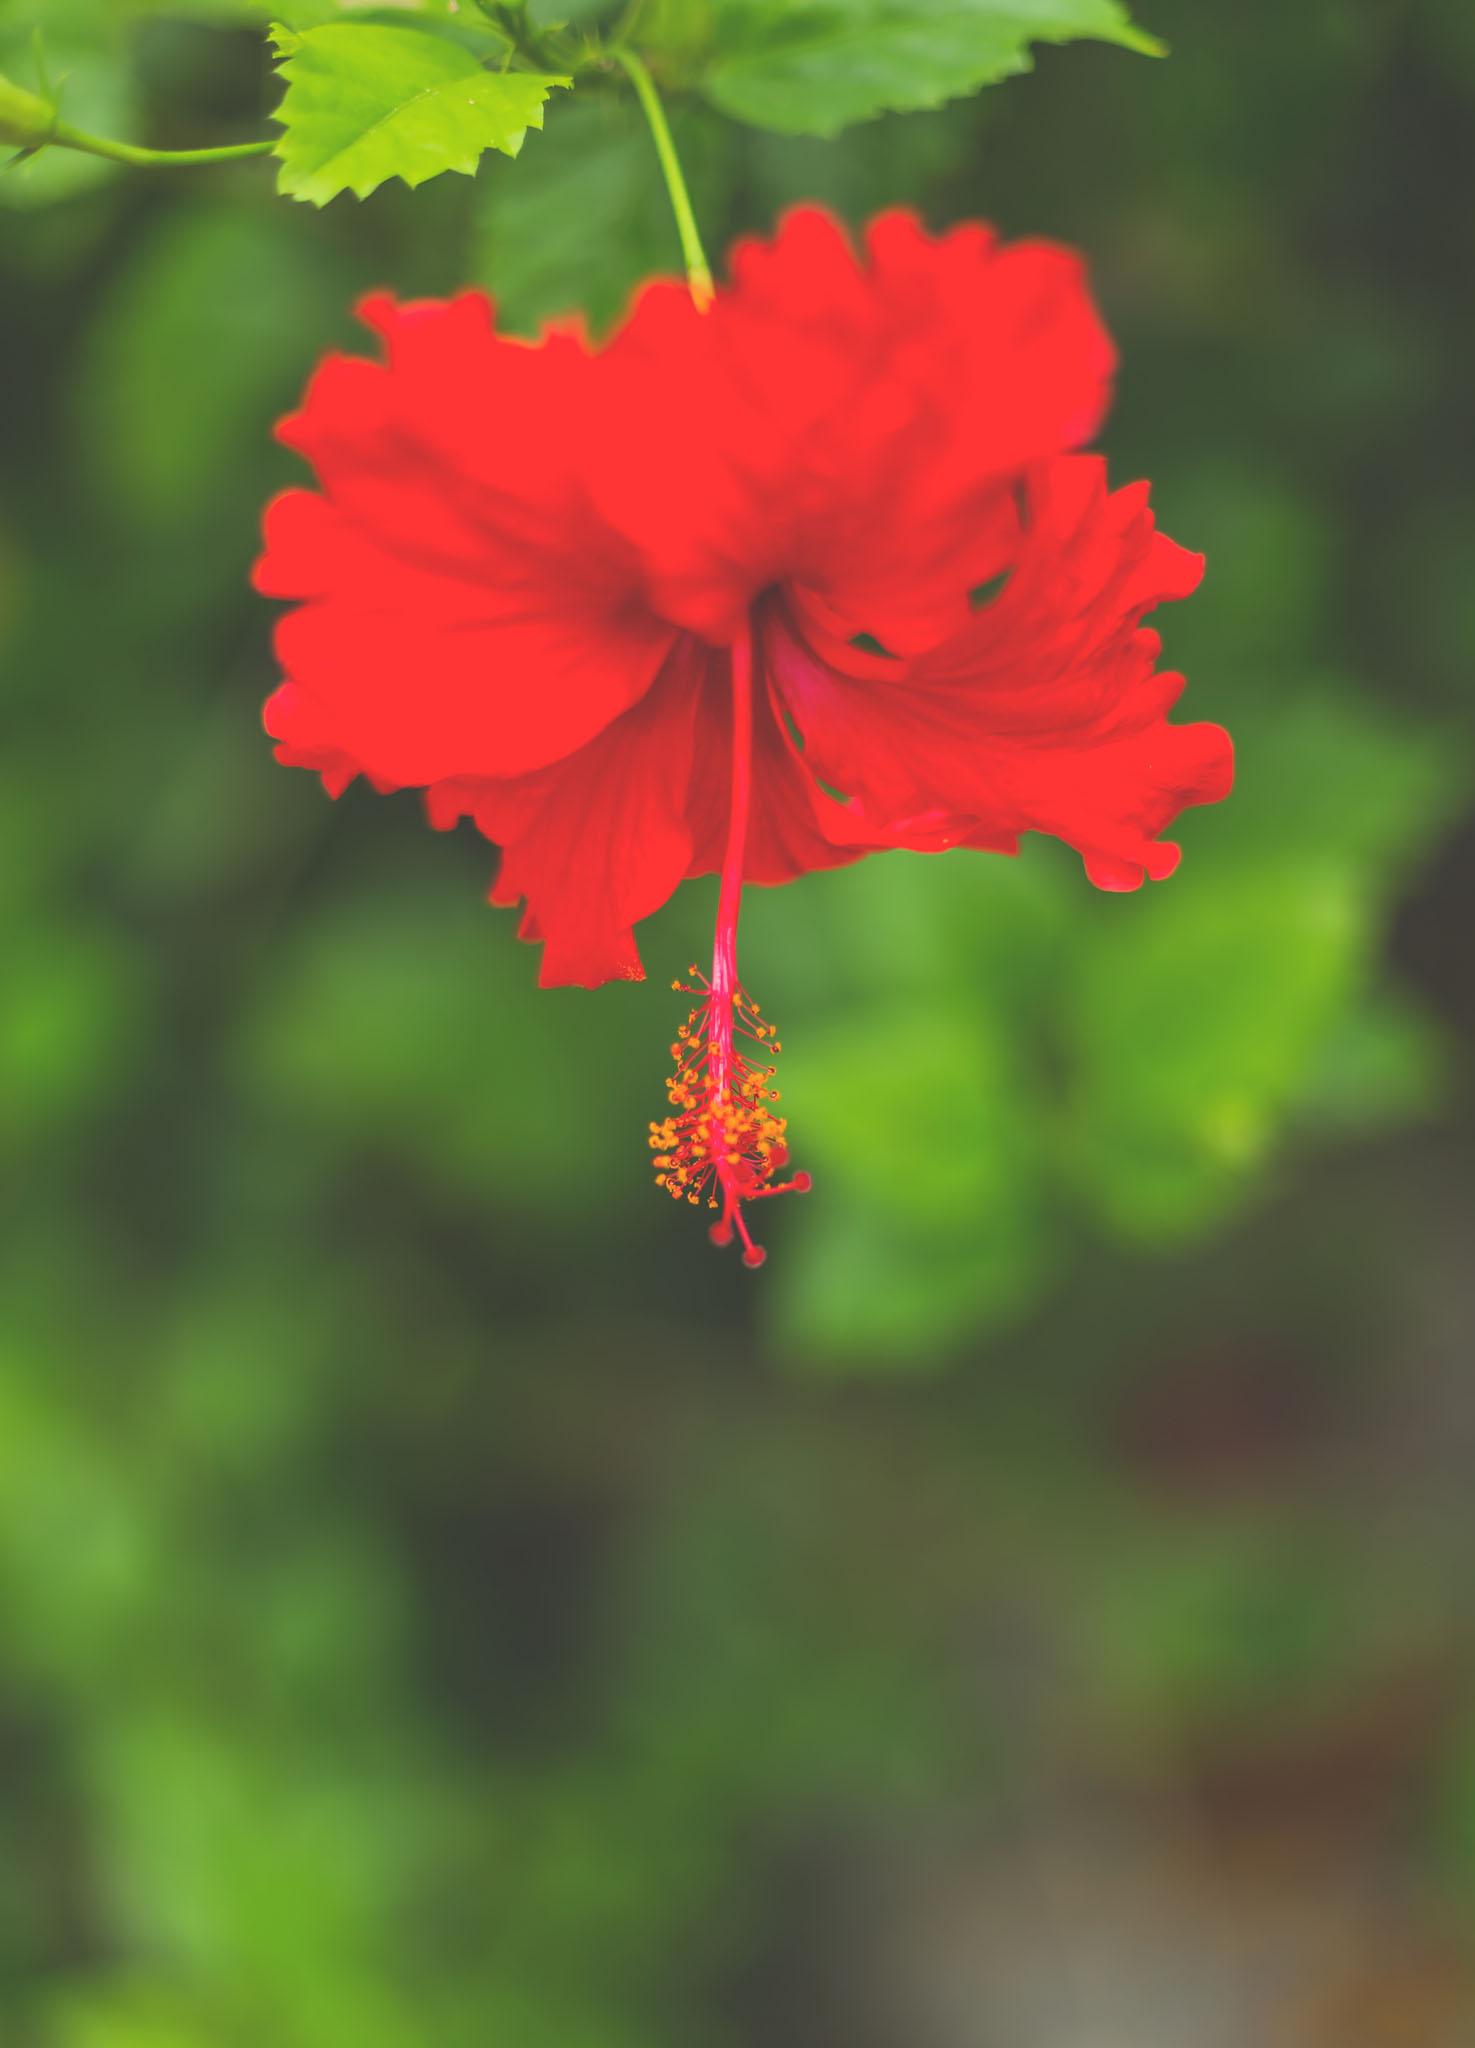 akumal, mexico, travel photography, jennifer picard photography